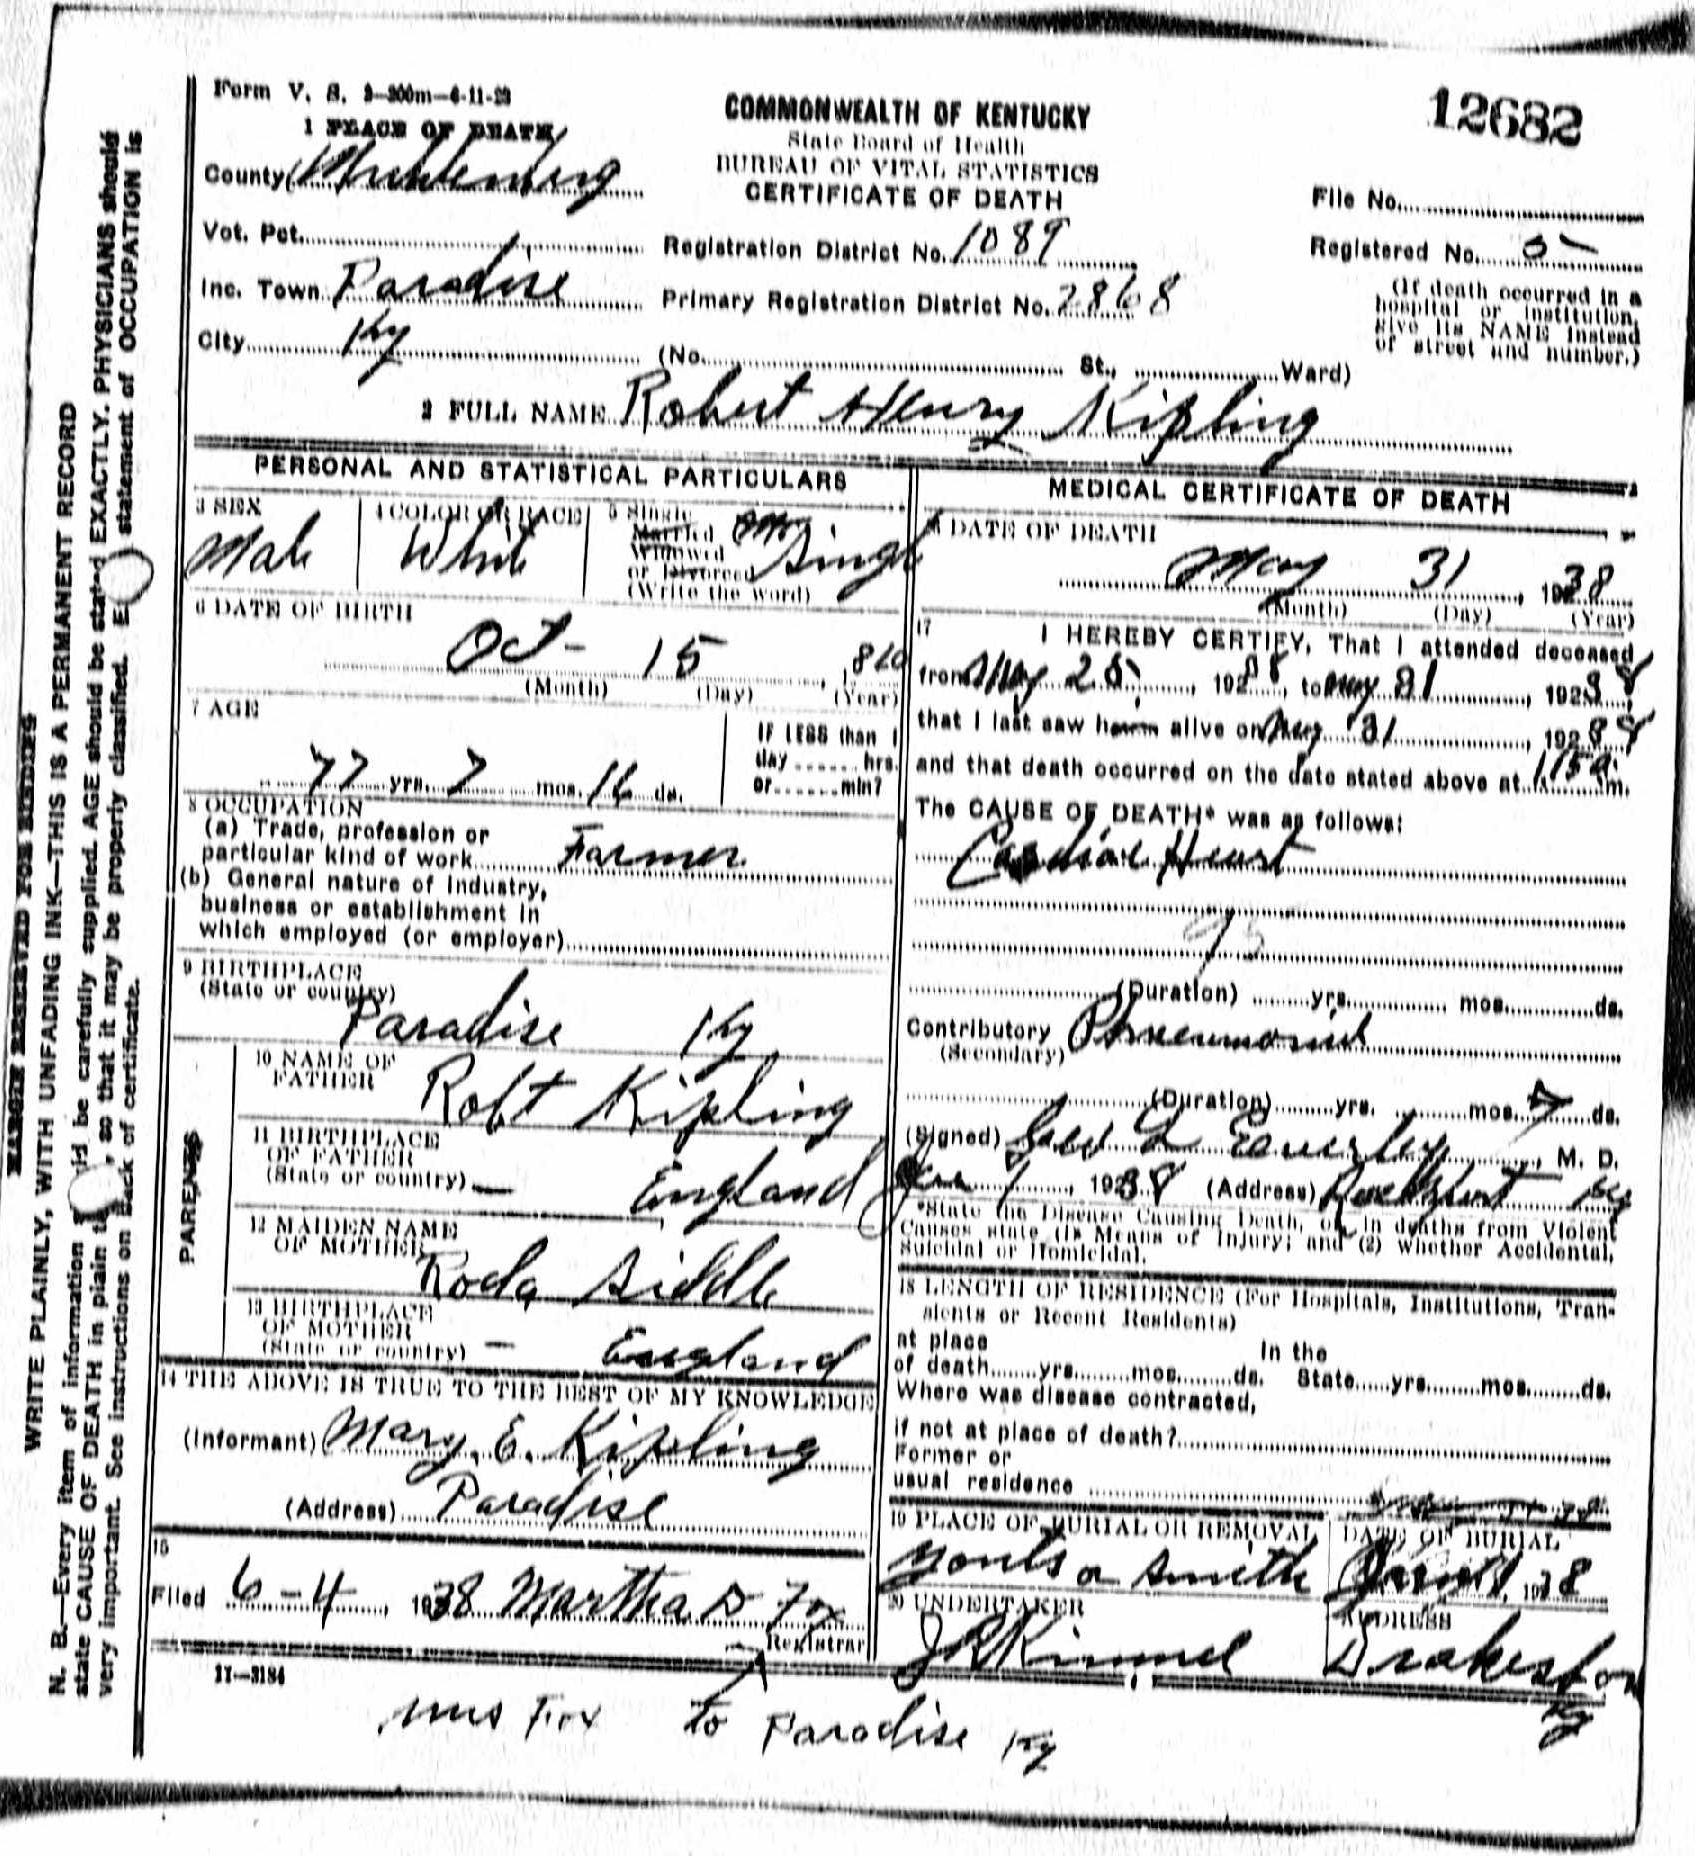 Death certificates k kentucky death certificate 12682 1betcityfo Images